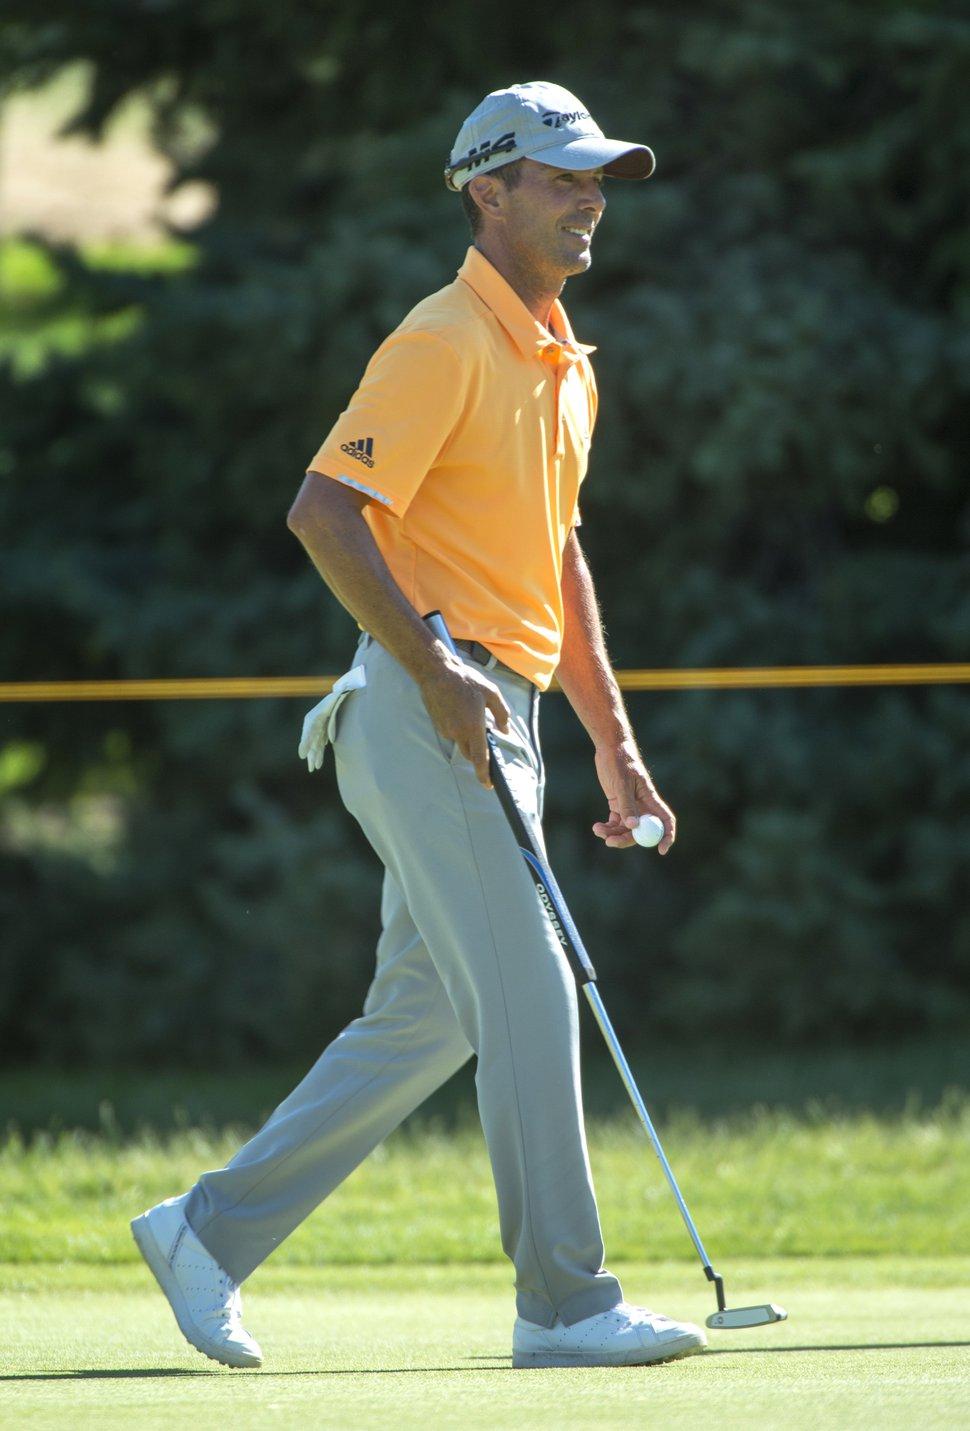 (Rick Egan | The Salt Lake Tribune) Mike Weir plays in the Utah Championship golf event on the Web.com Tour at Oakridge Country Club in Farmington, Thursday, July 12, 2018.